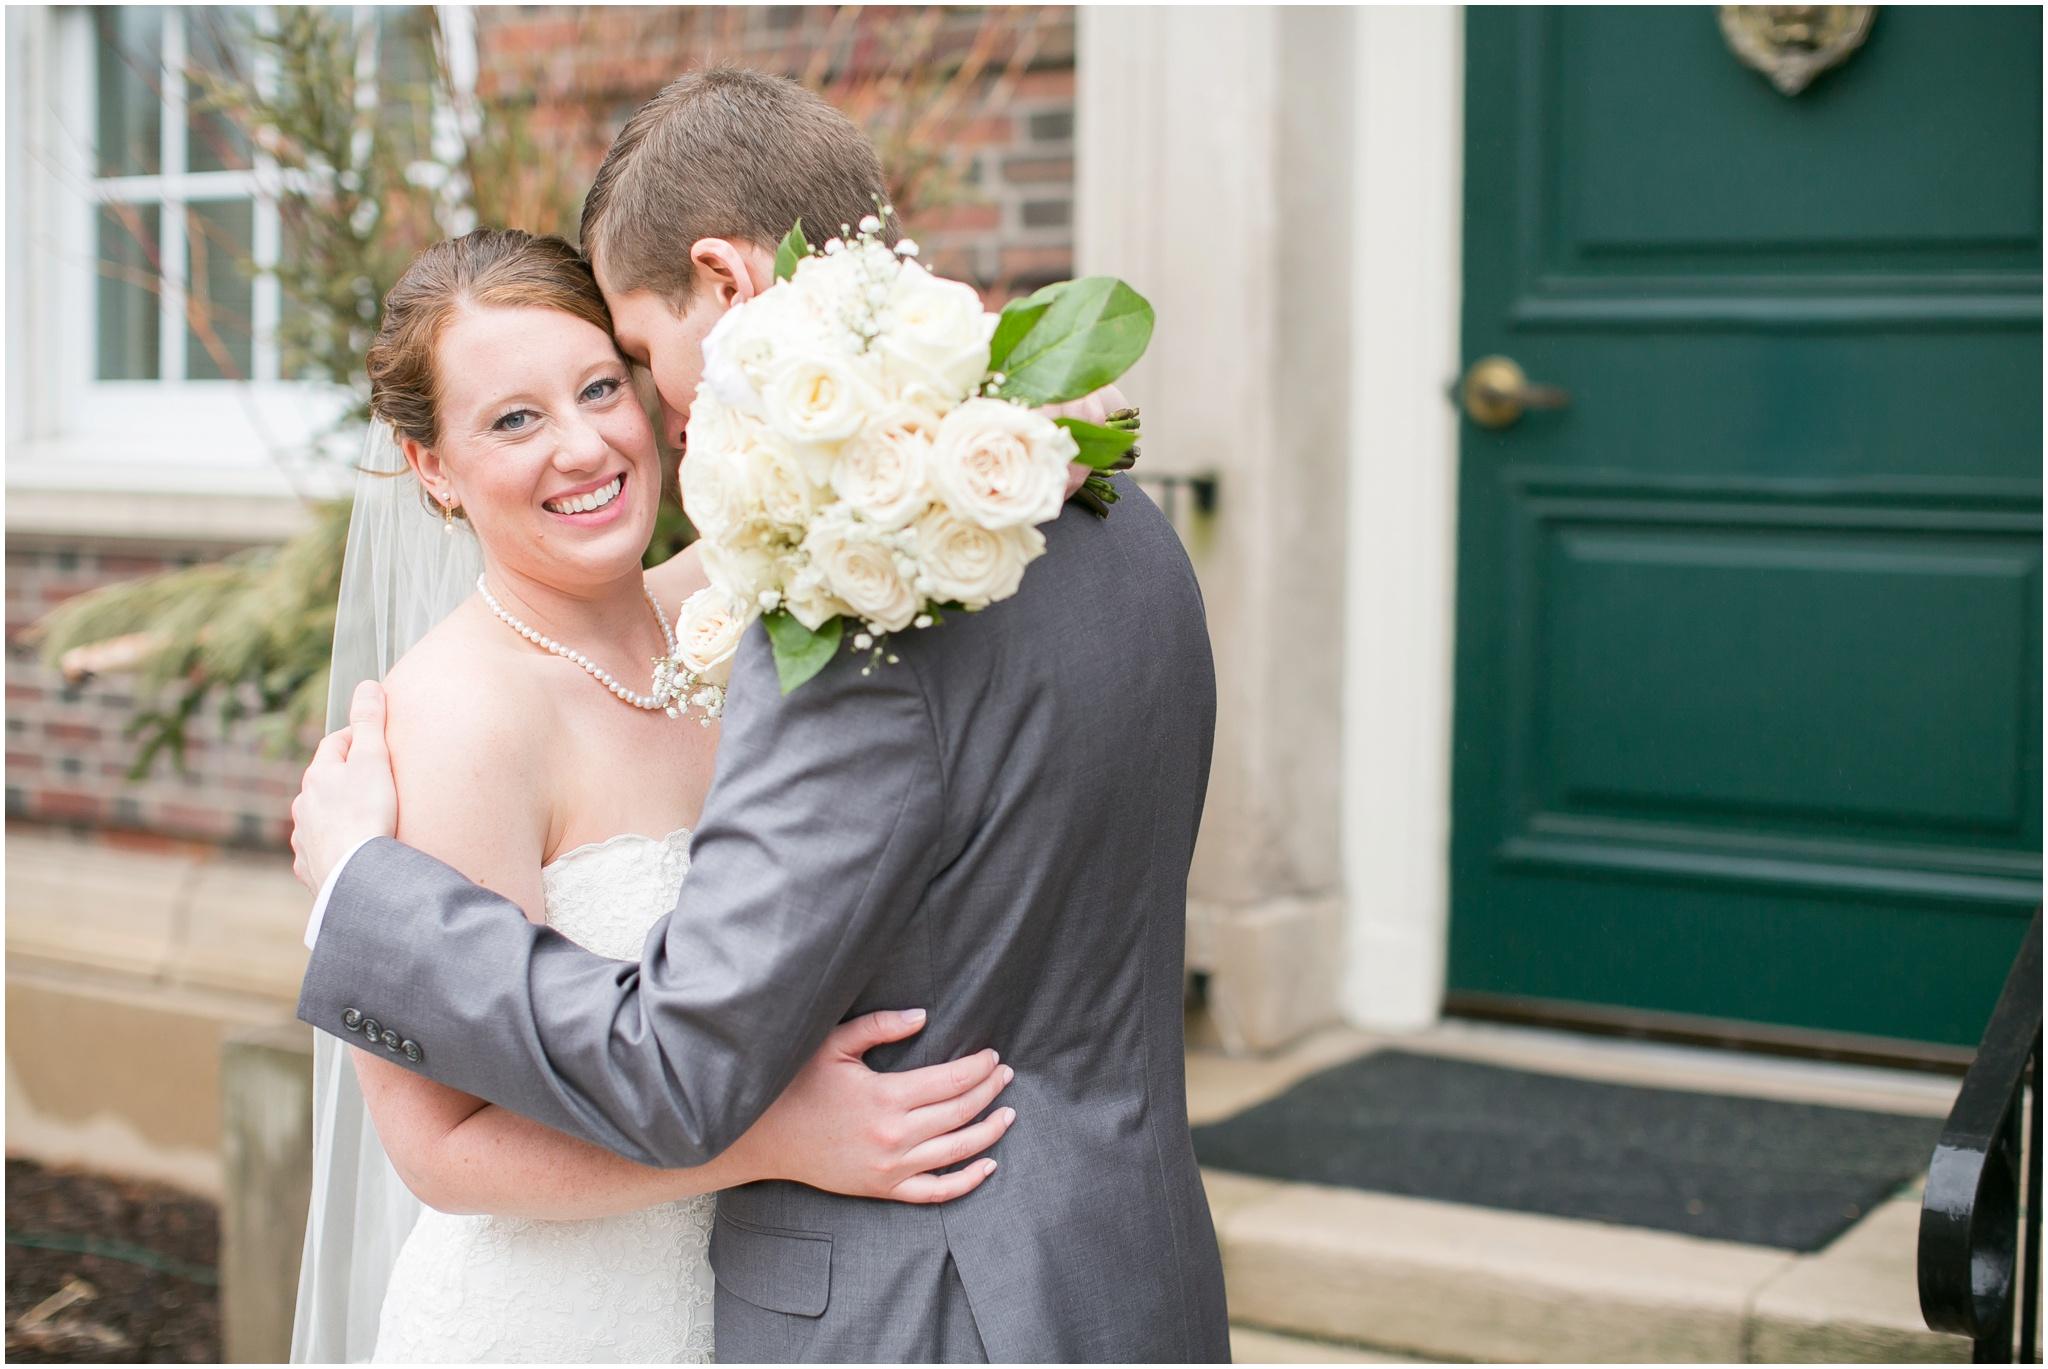 Madison_Club_Madison_Wisconsin_Wedding_Photographer_Spring_Rainy_Wedding_2619.jpg